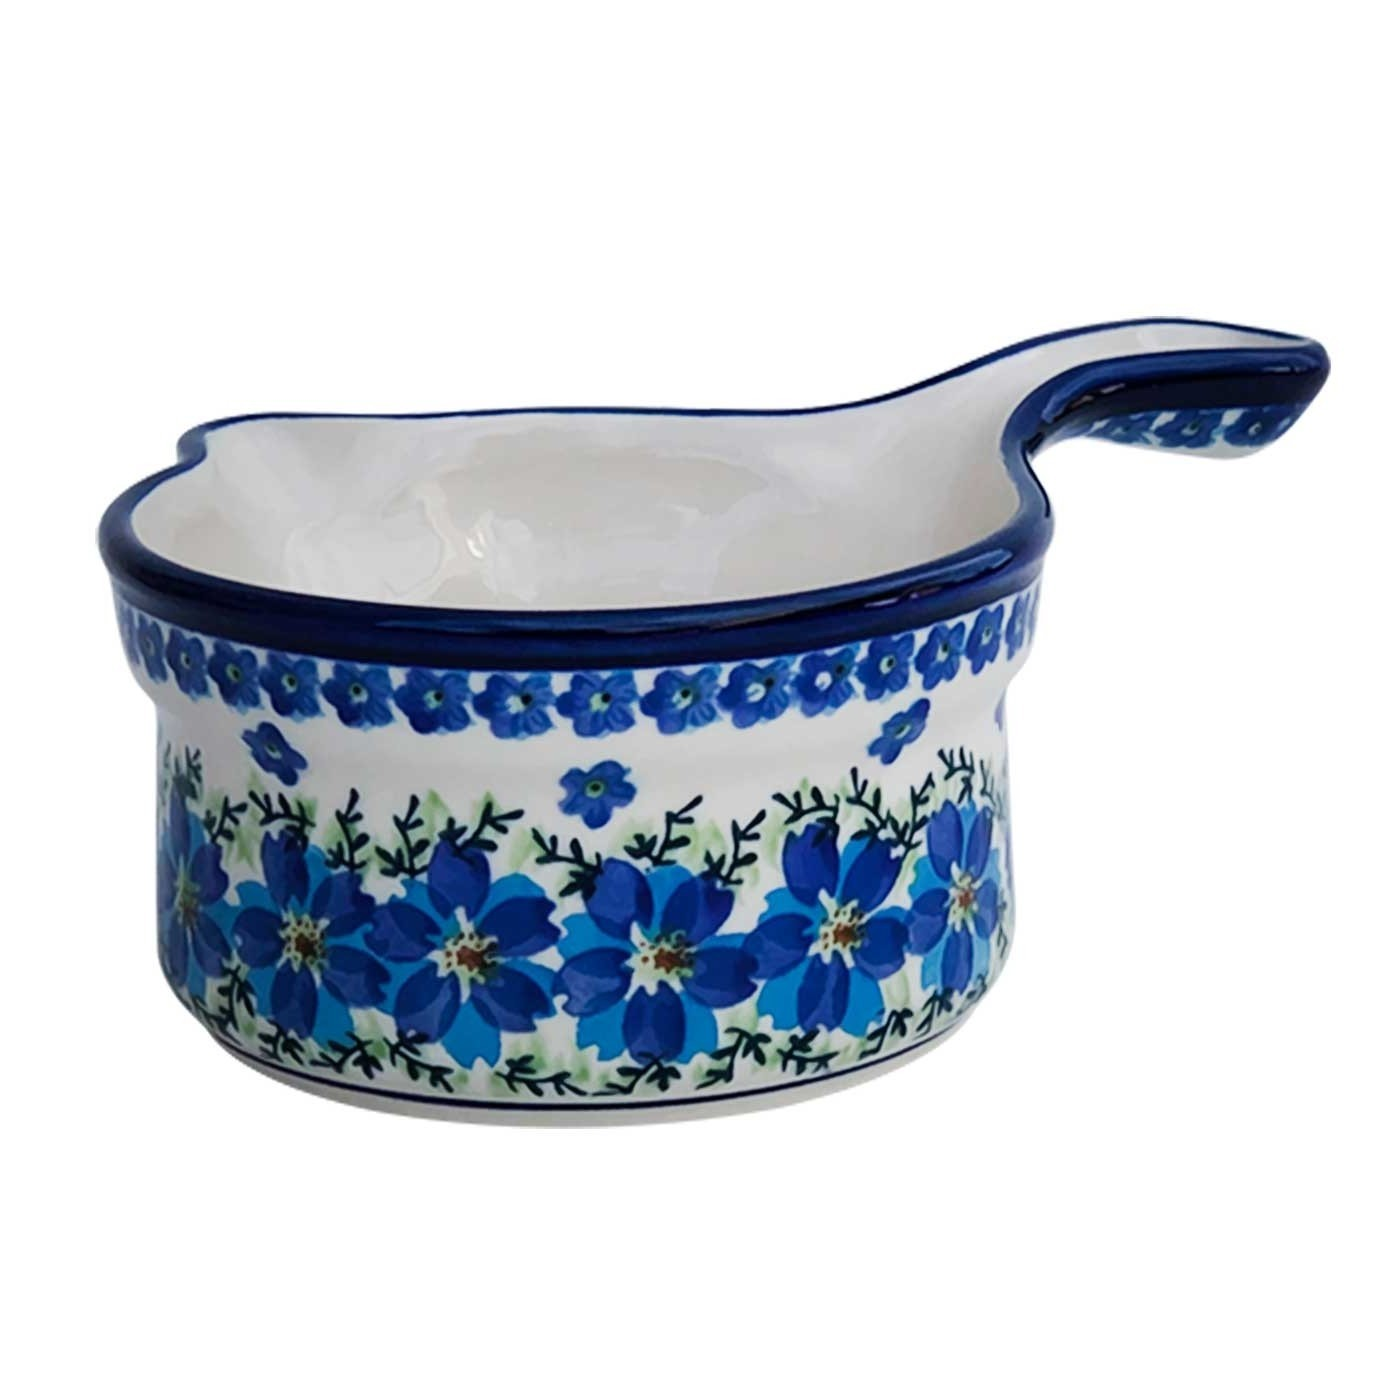 Pottery Avenue MOD FLORAL Stoneware Handled Stew Pan - 269-DU233